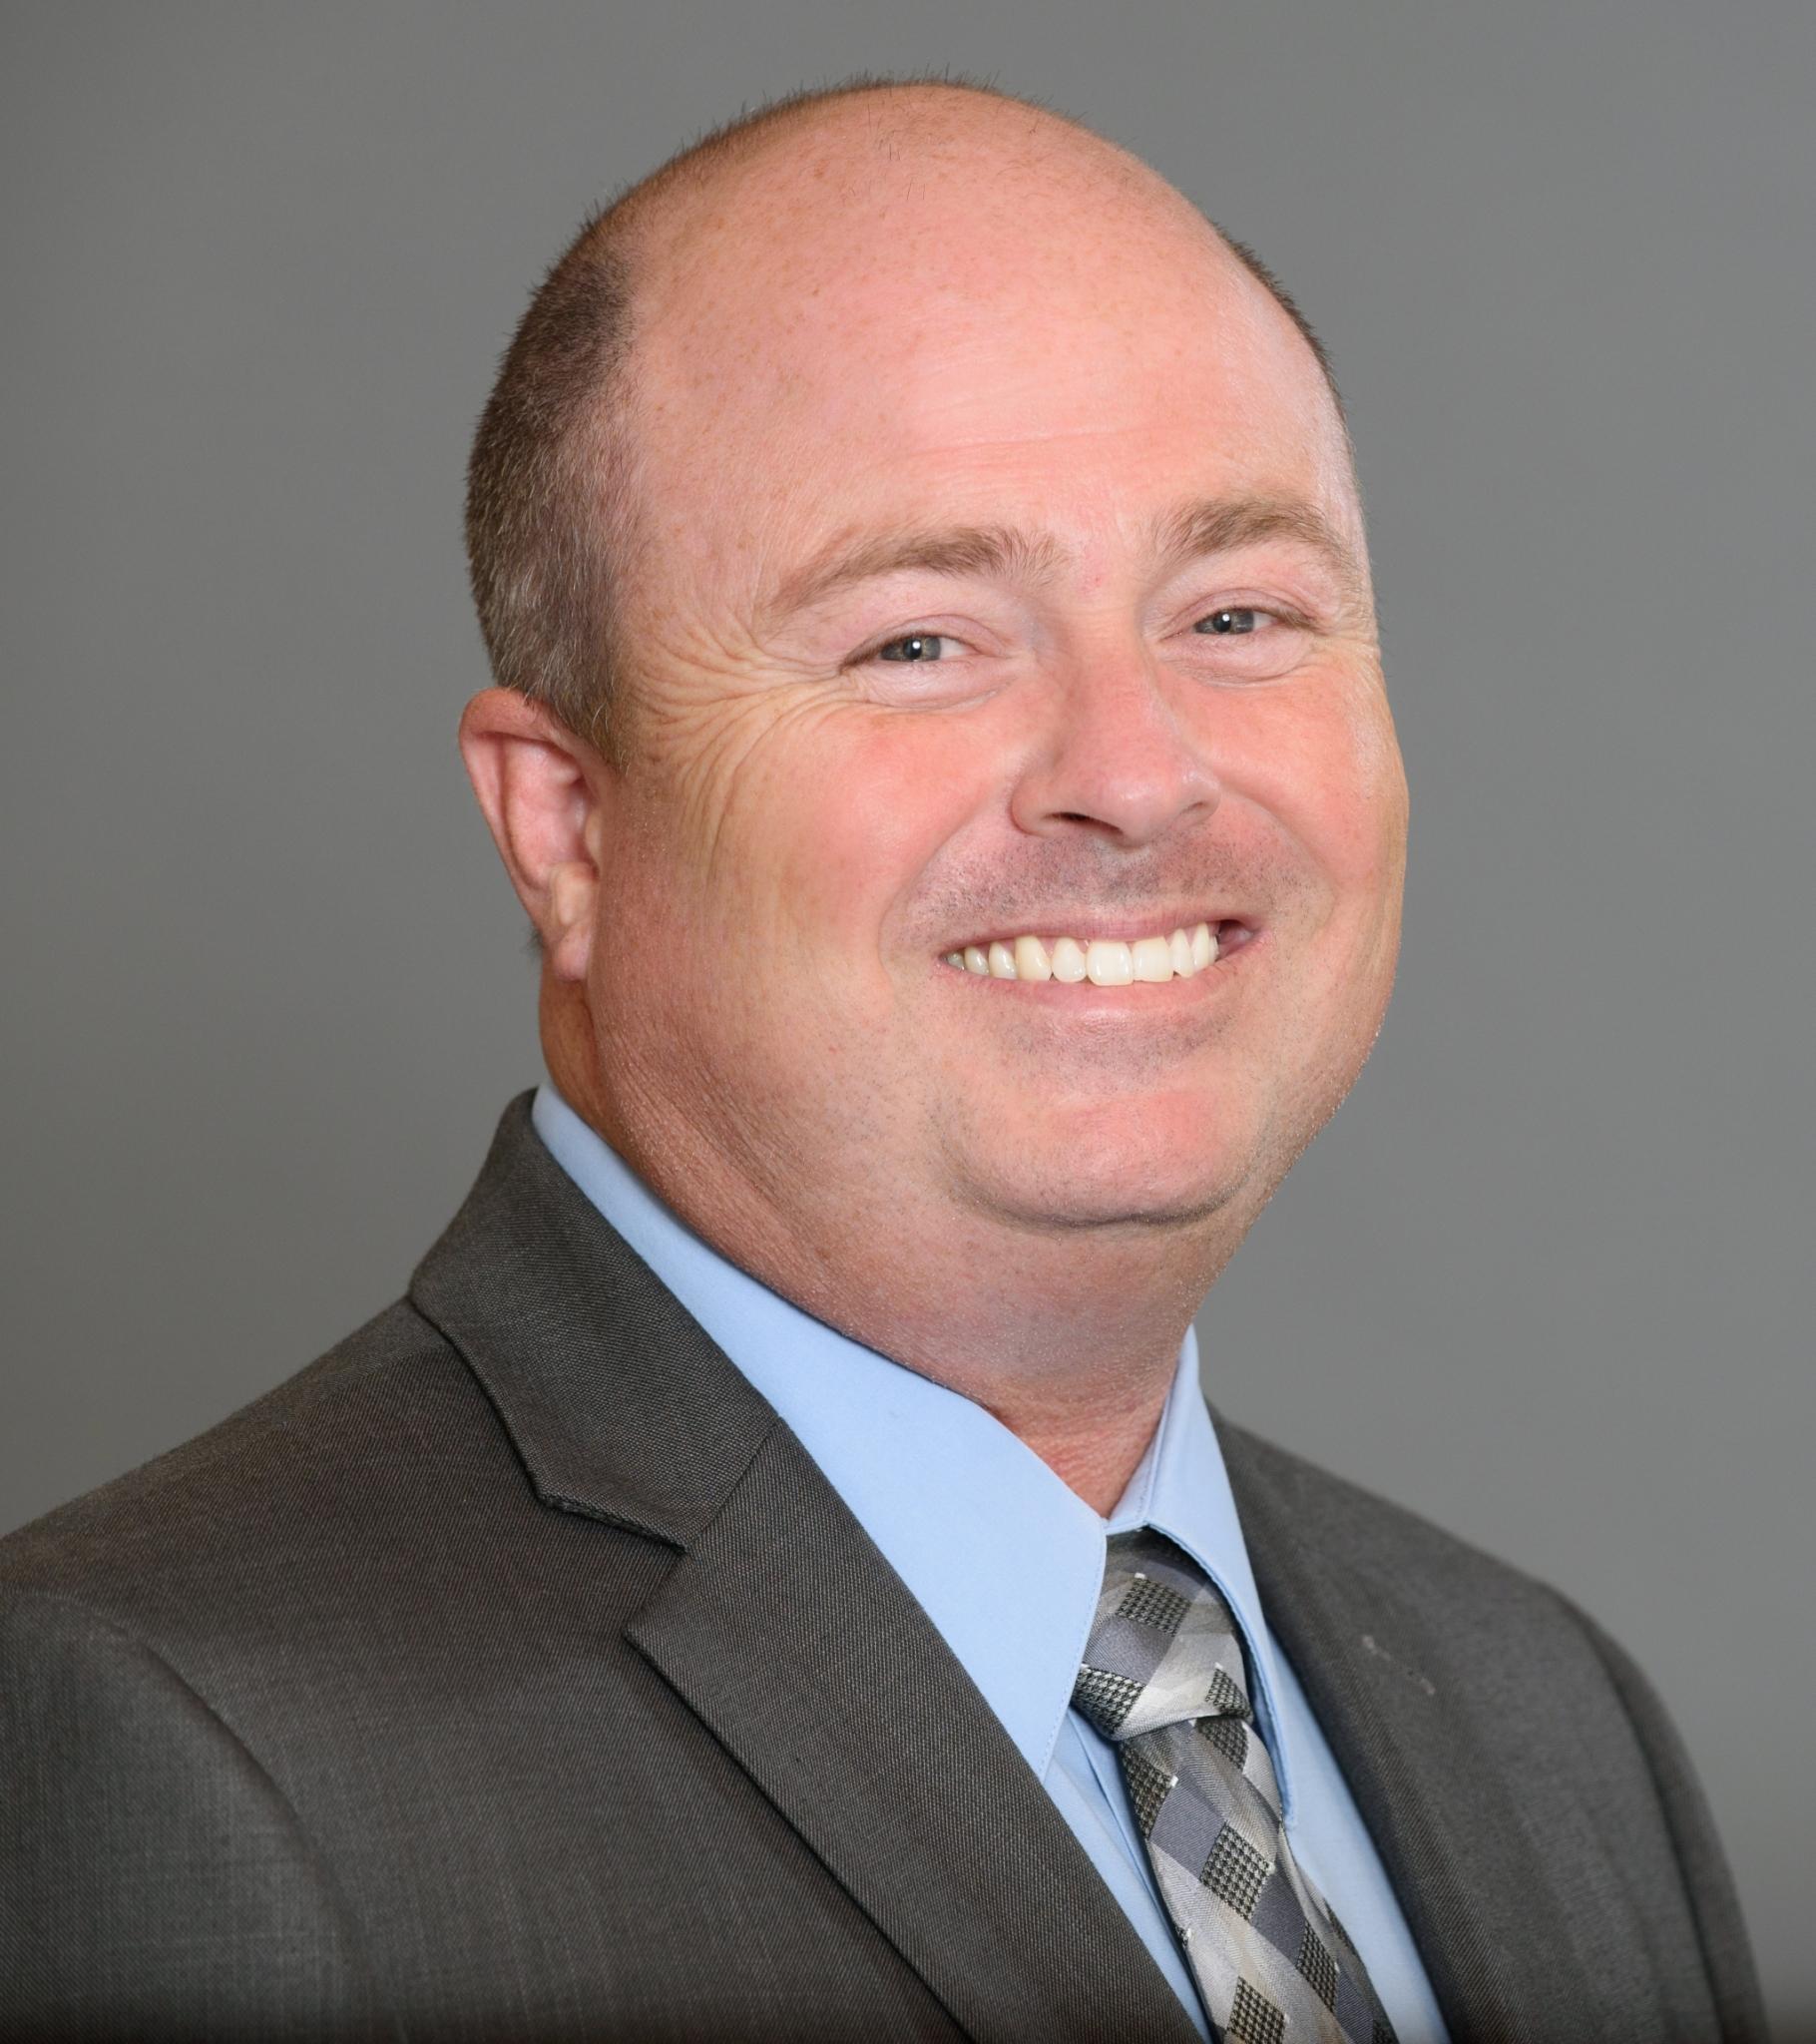 Headshot of Anthony Evett, Director of Engineering